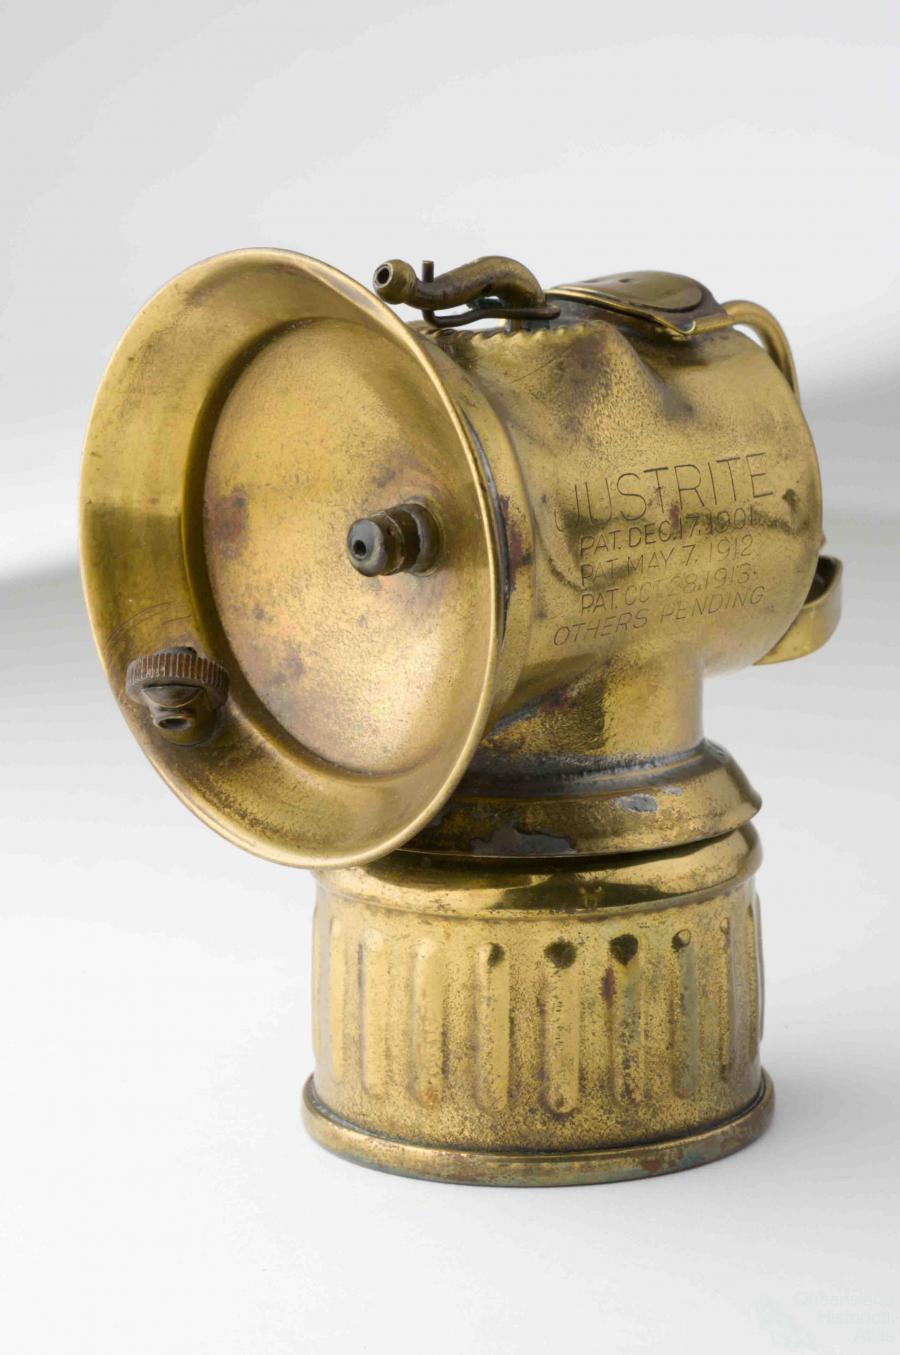 Carbide miners lamp | Queensland Historical Atlas